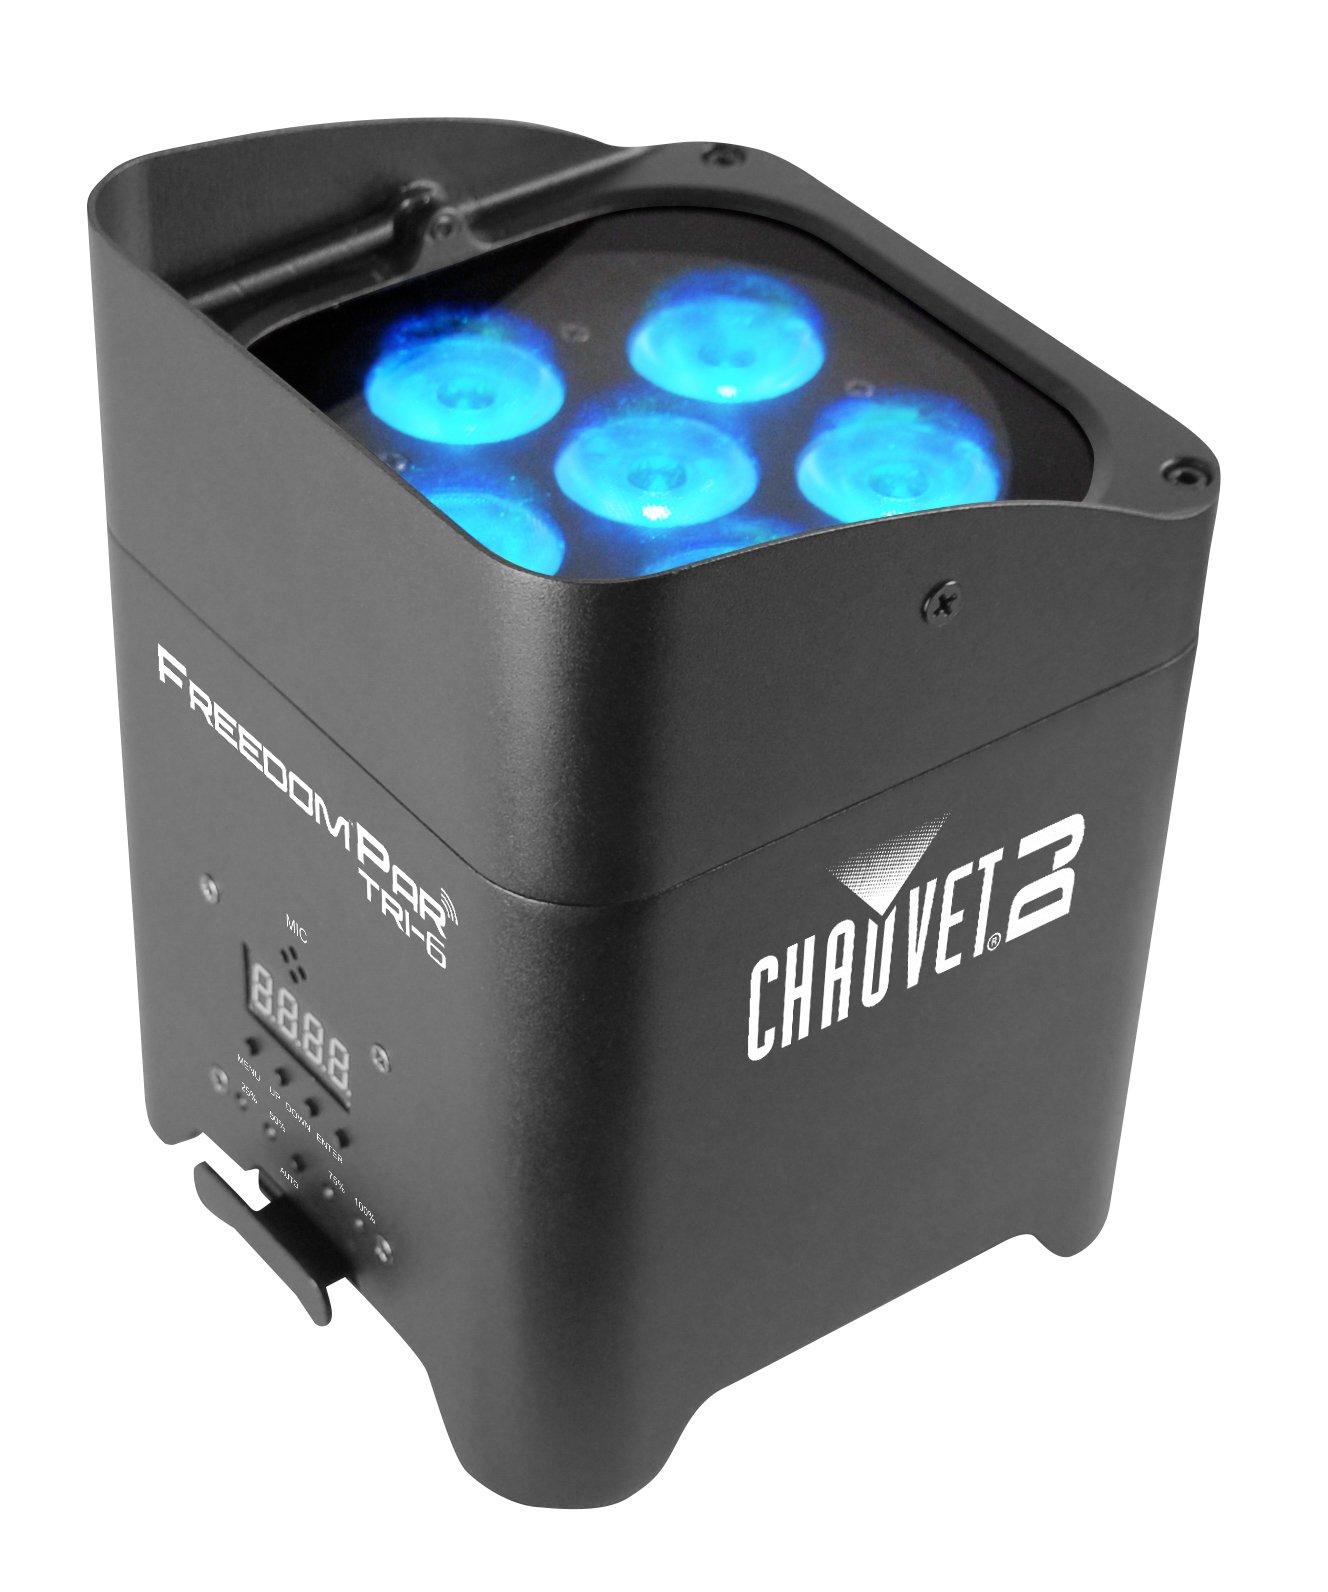 CHAUVET DJ Freedom Par Tri-6 Battery-Operated RGB LED Wash Light   LED Lighting